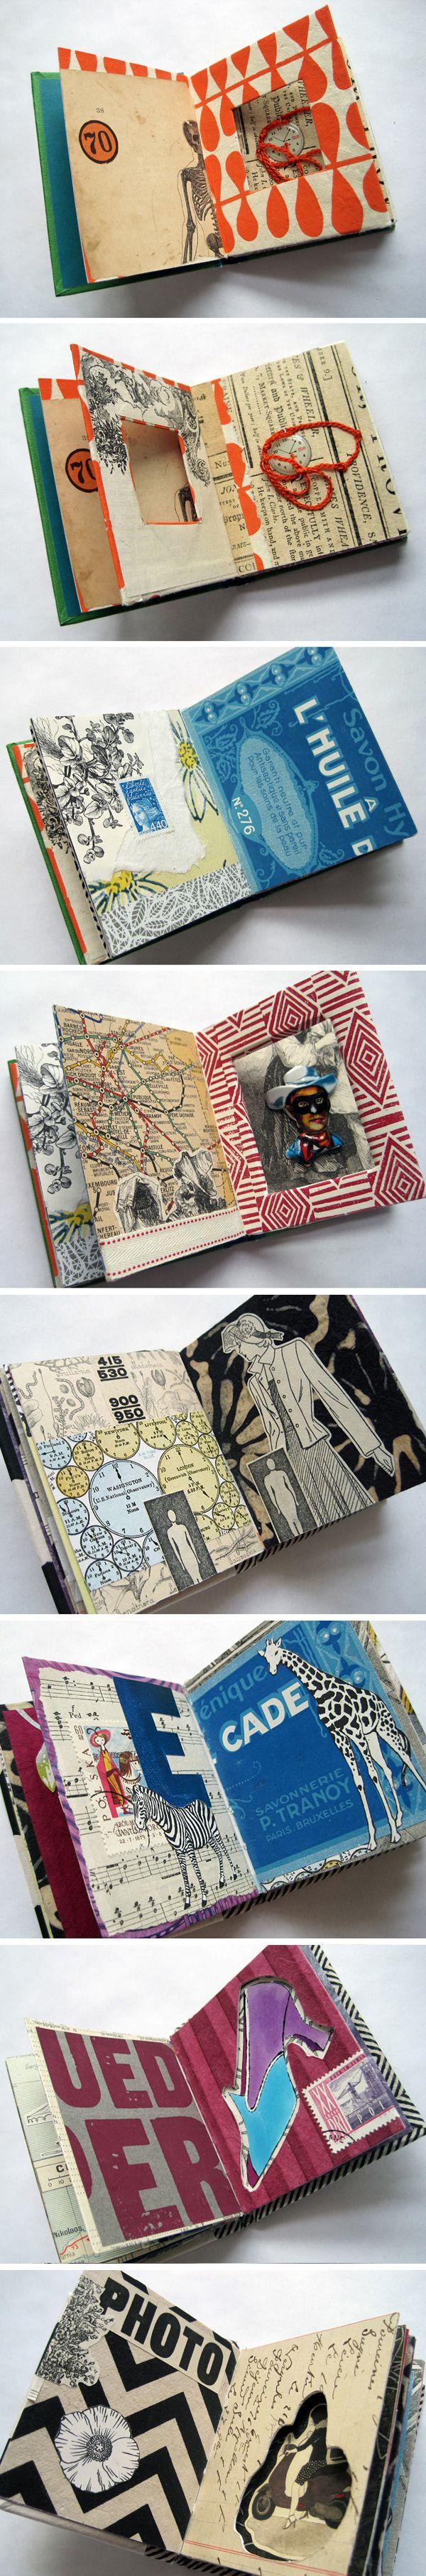 Book Art + Collage by Trish Leavitt, via Behance   Art: Books ...